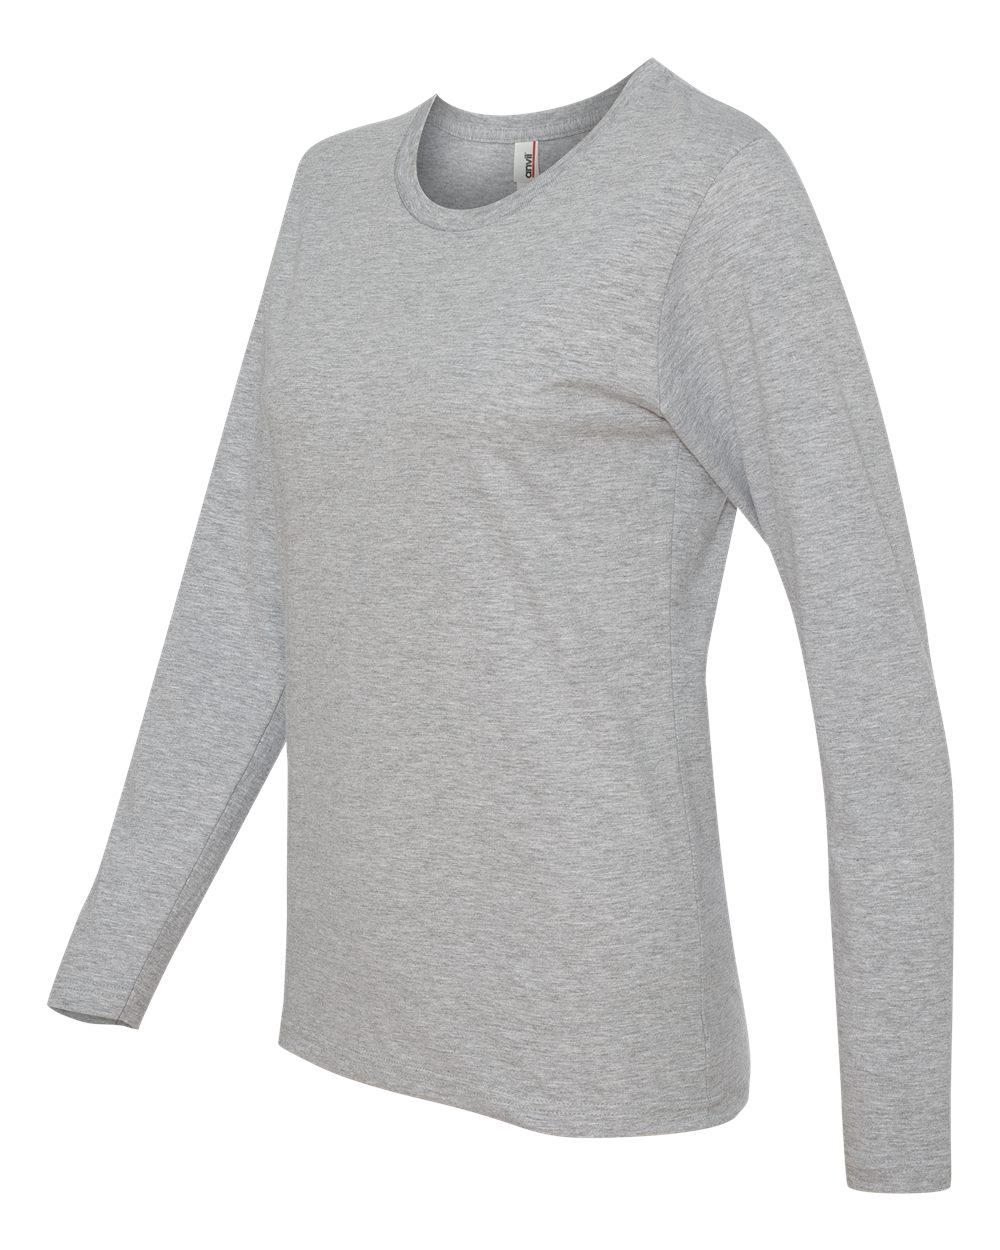 Anvil-Womens-Lightweight-Long-Sleeve-T-Shirt-884L-Size-S-2XL thumbnail 13